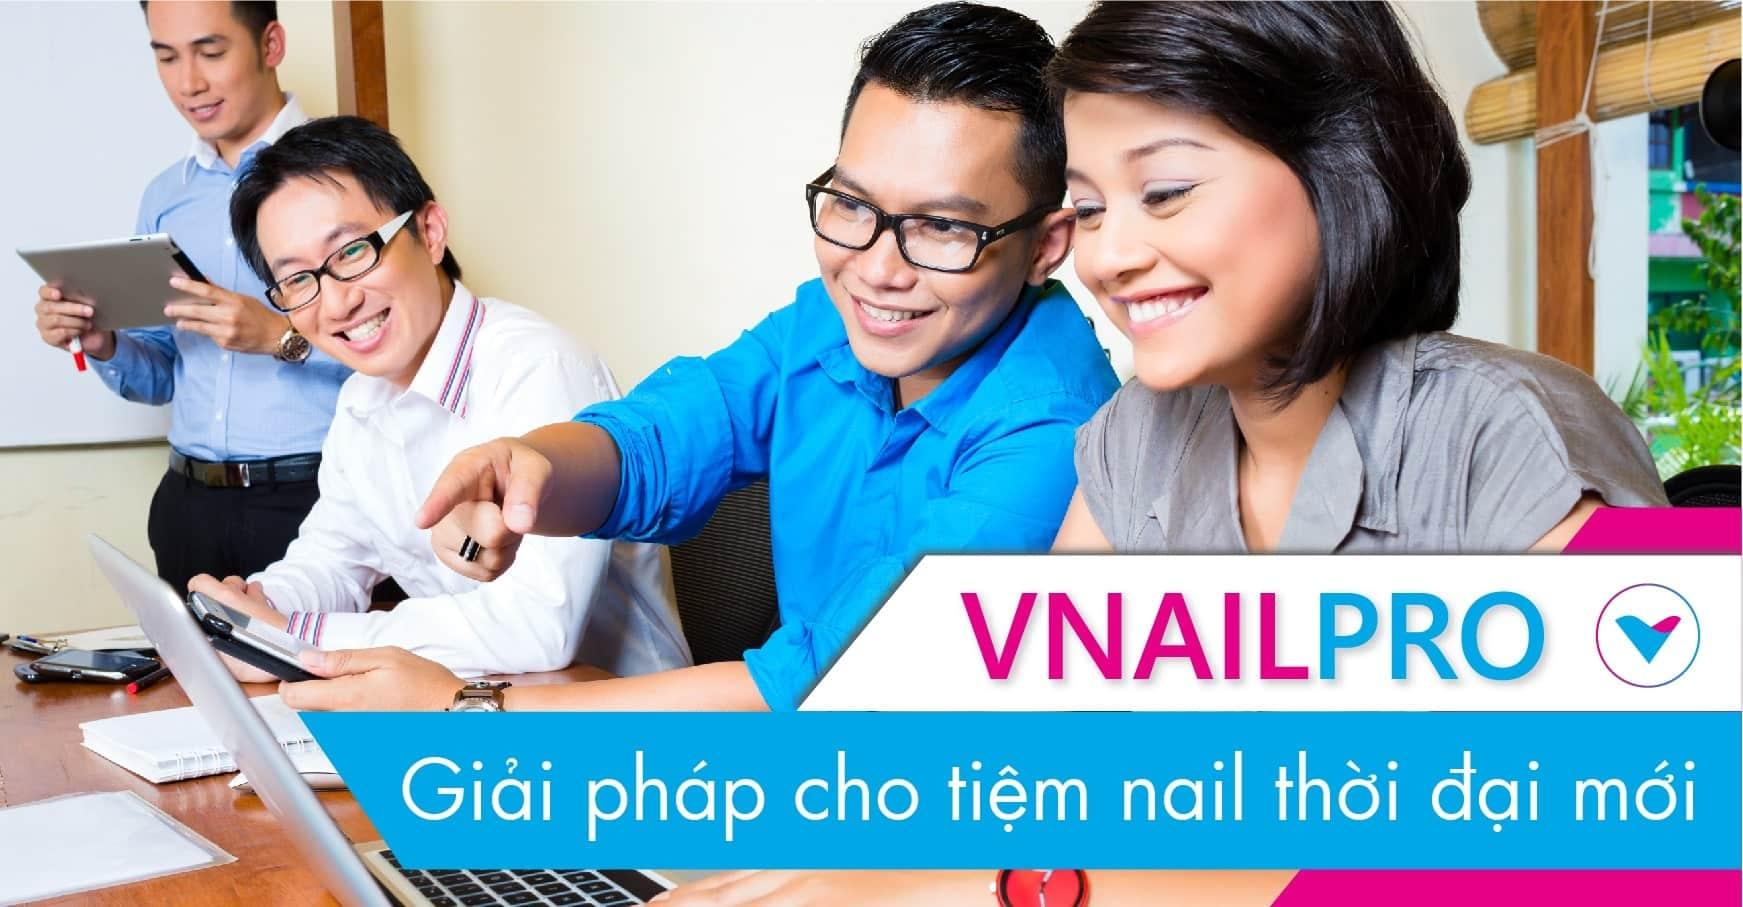 VNailPro Feature Image